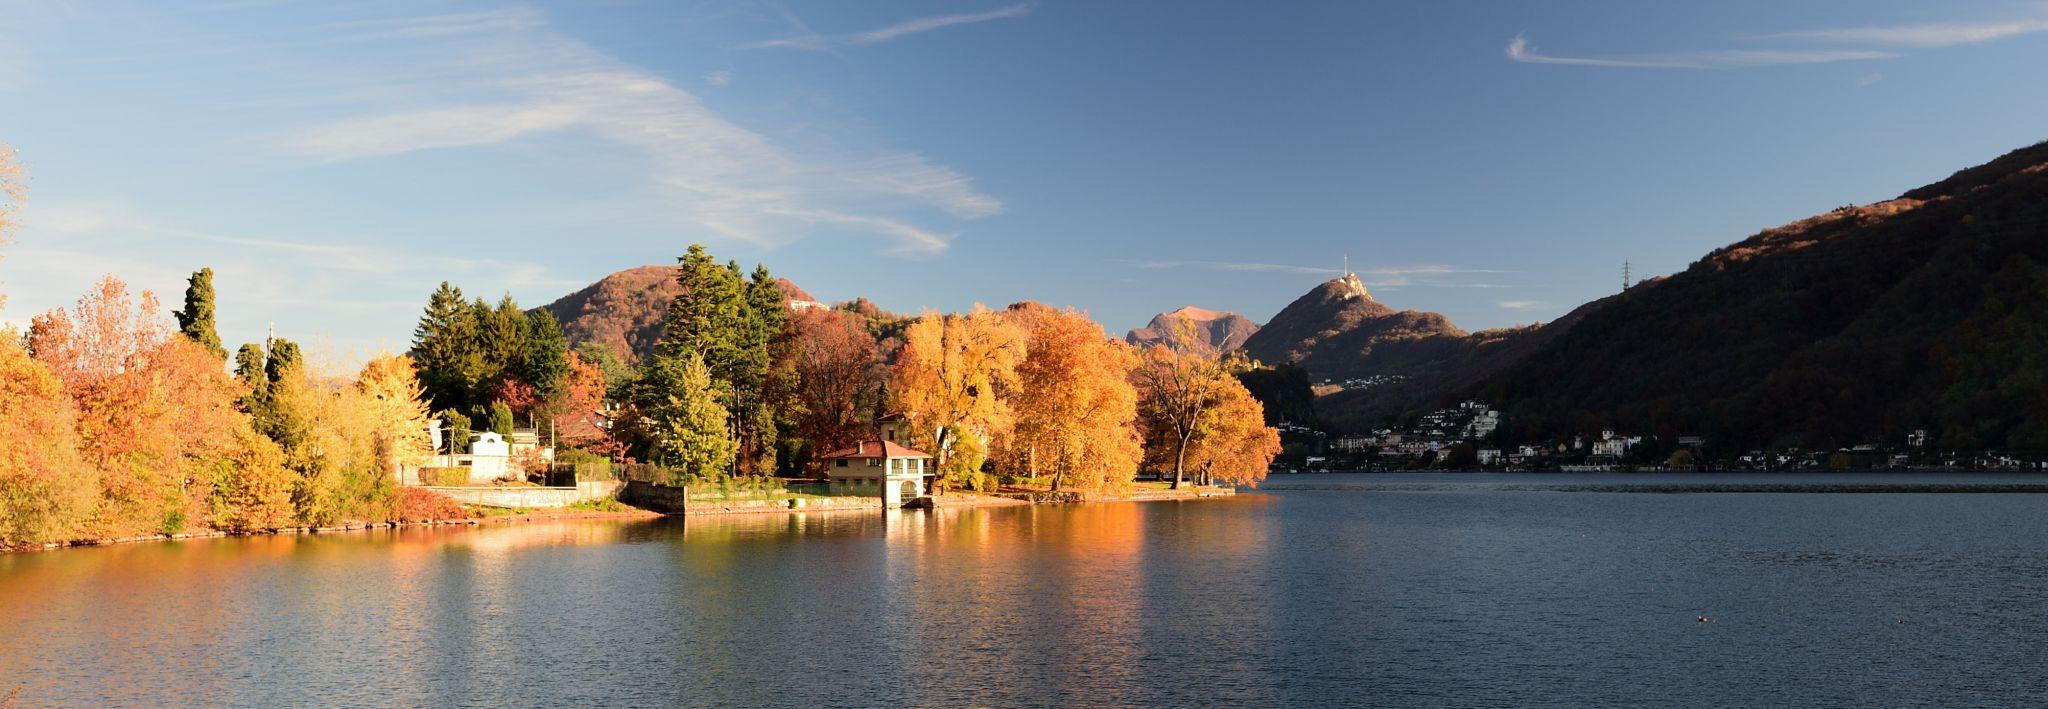 the lake of Lugano (CH) from Lavena and Porto Ceresio (IT), Italy